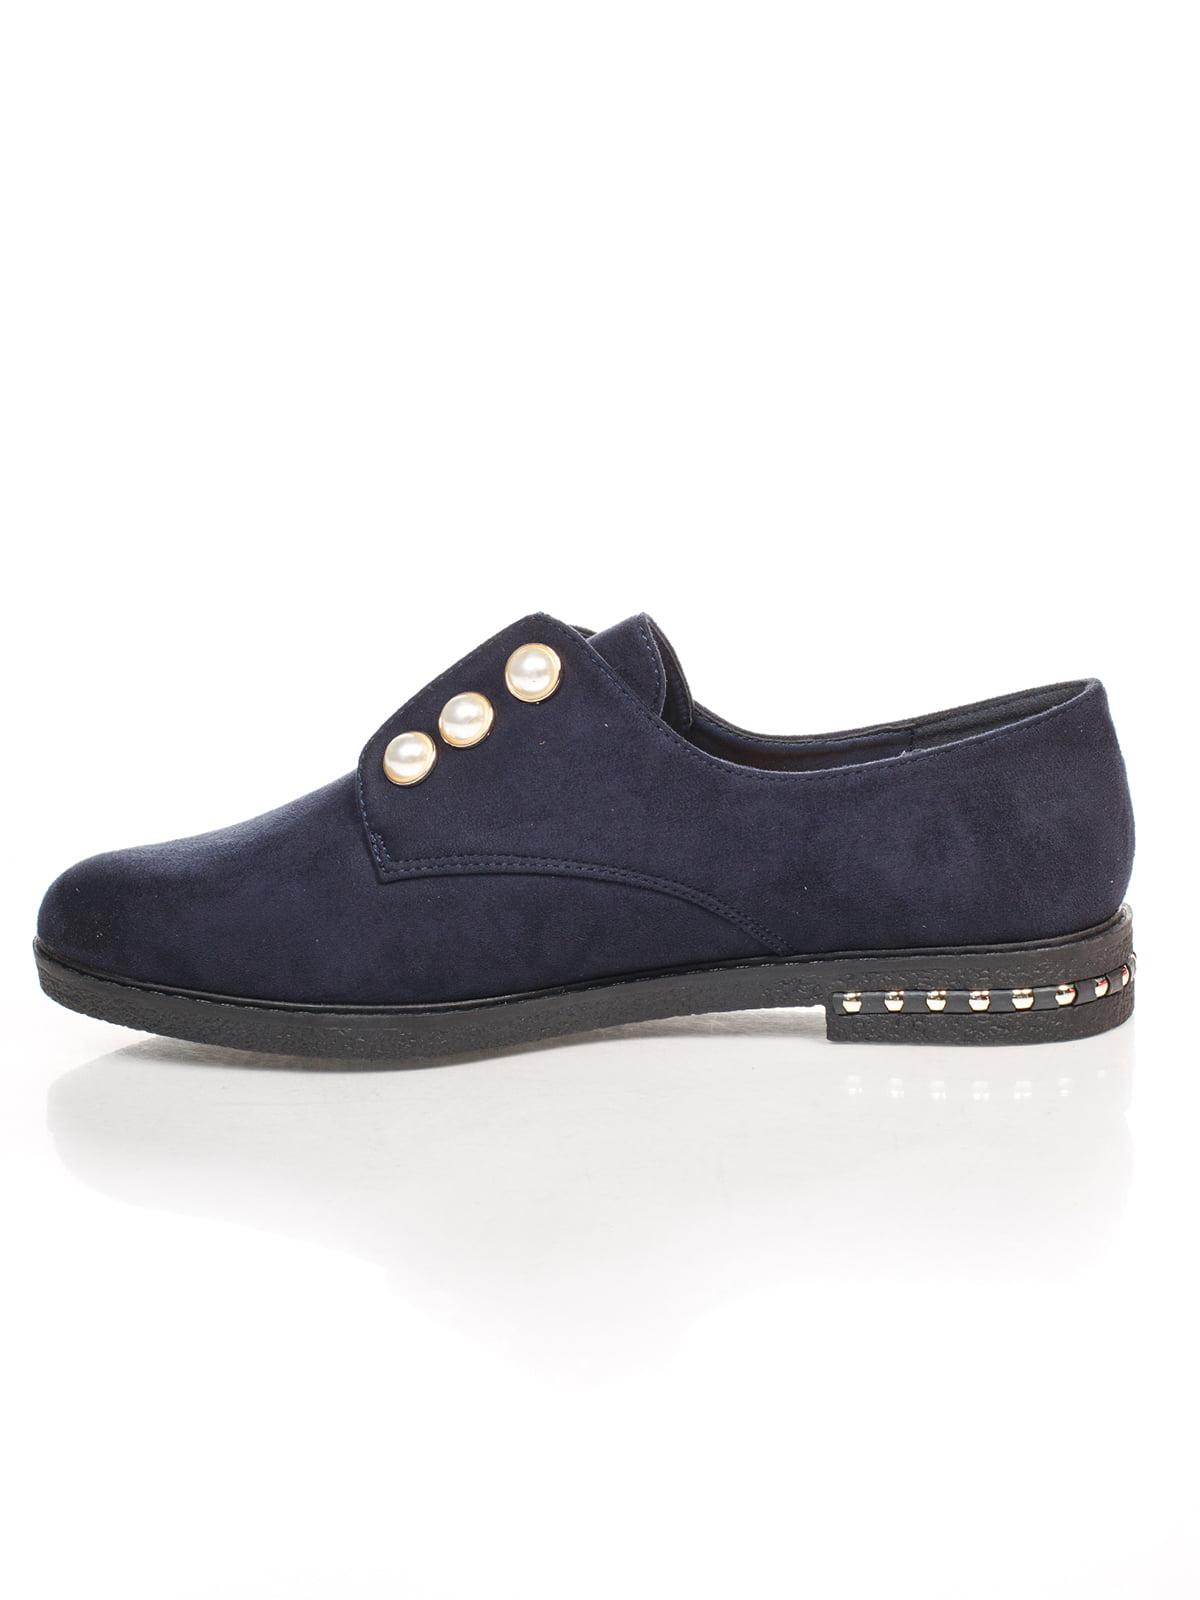 Туфли синие с декором | 4605868 | фото 2